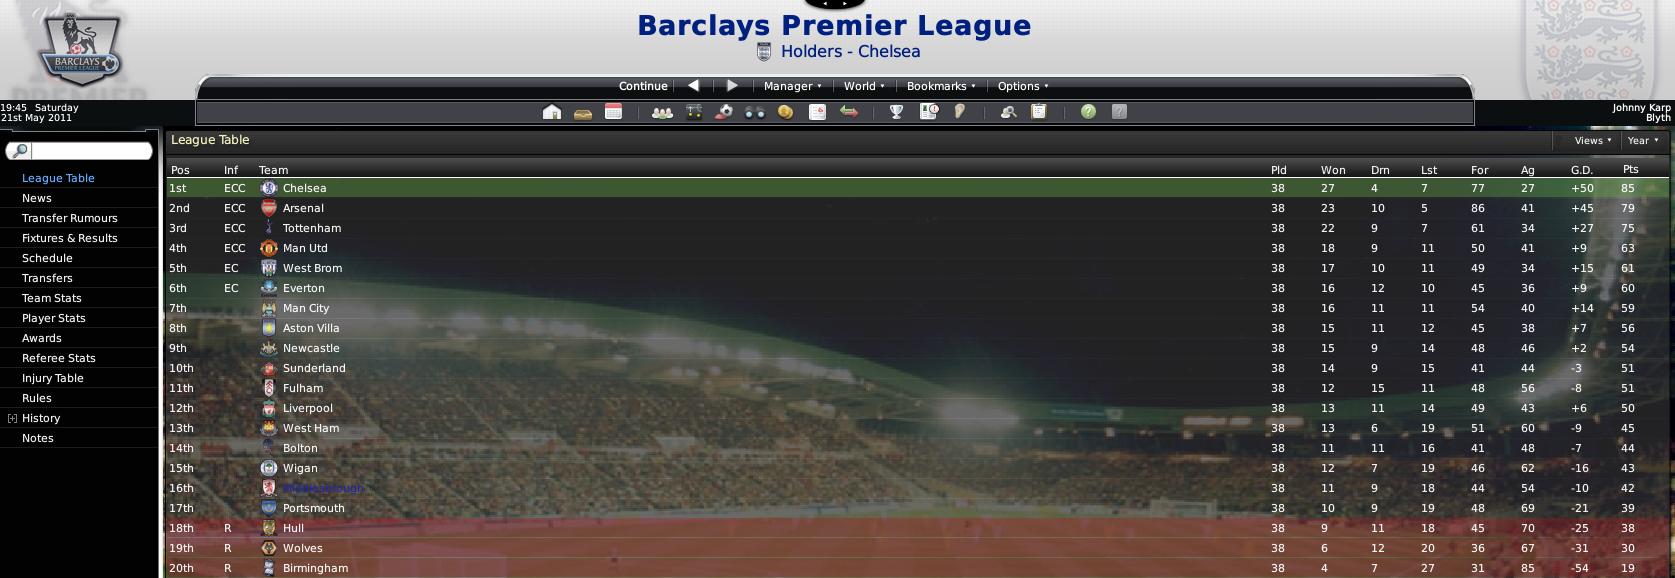 Premier League Table Week by Week 2011 Premier League Table 2011